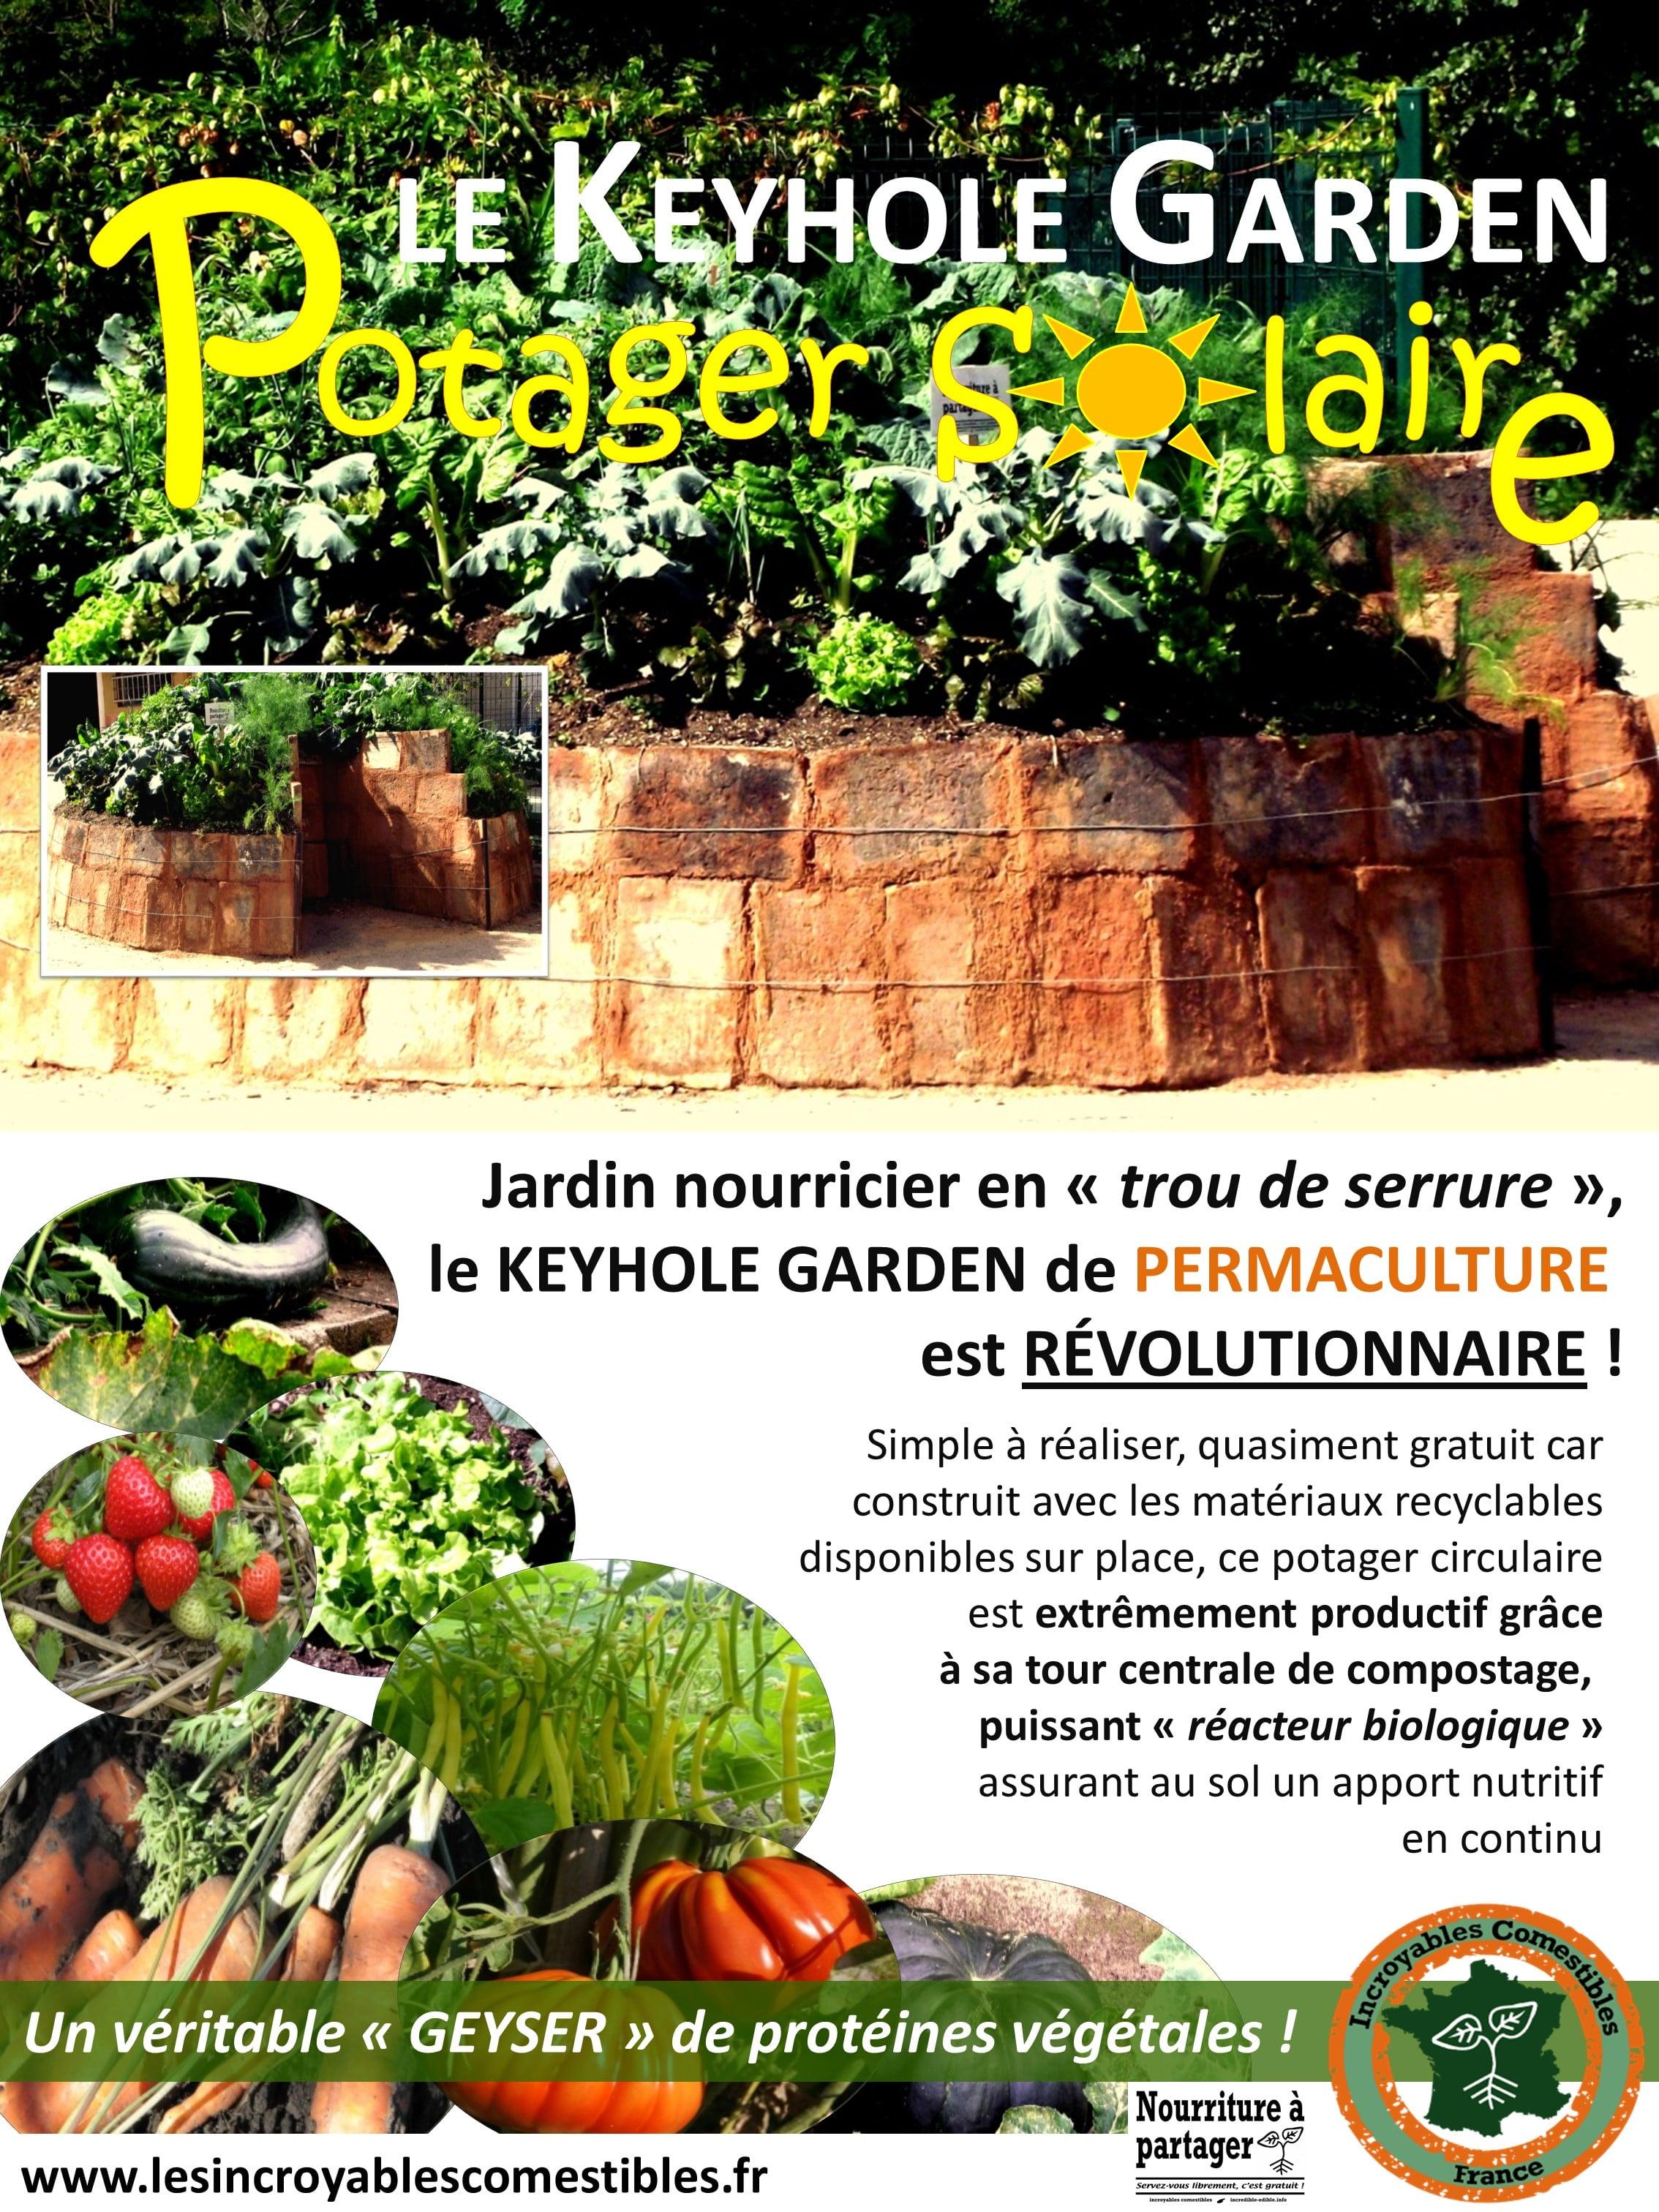 incroyables-comestibles_keyhole-garden_1